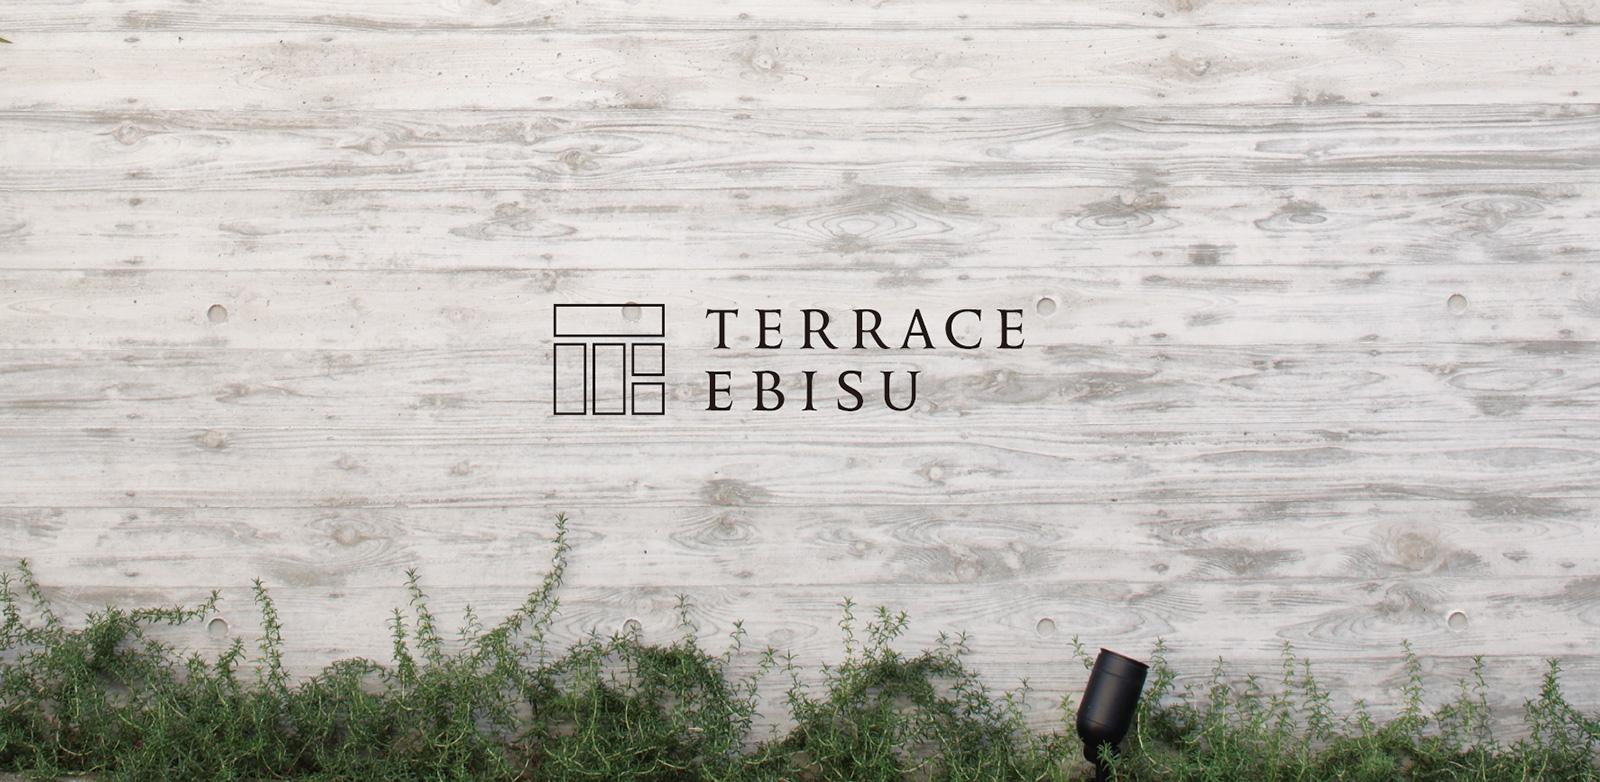 http://www.rc-zienokai.net/news/blogimages/terrace_ebisu.jpg